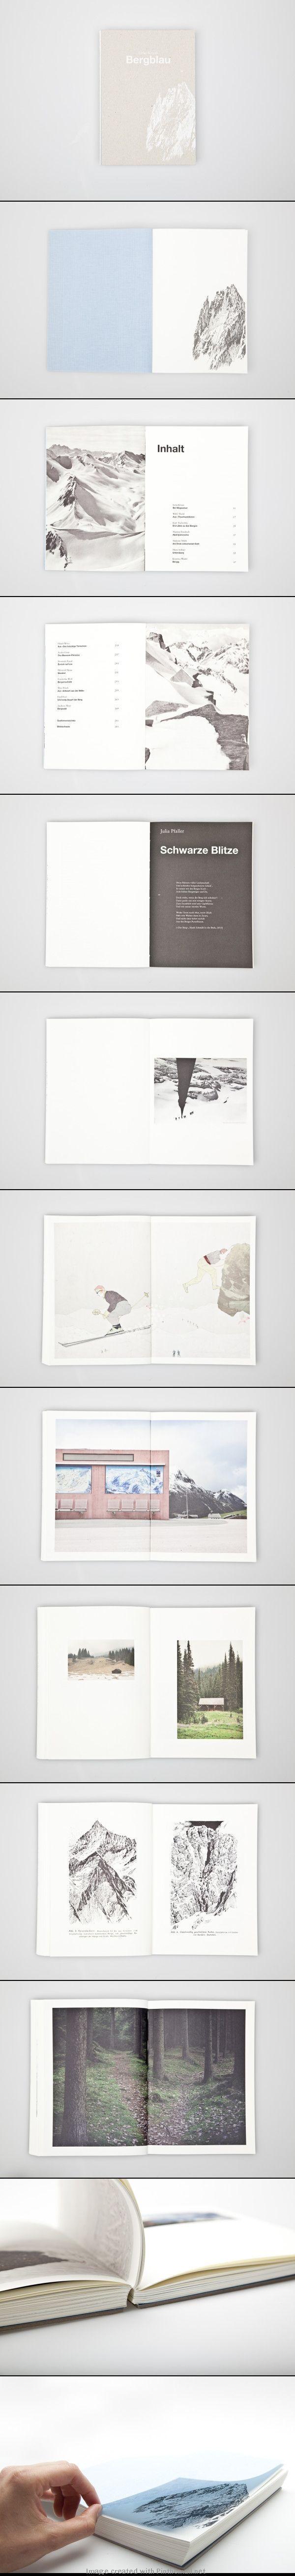 Bergblau book design - Simple layout design Inspiration